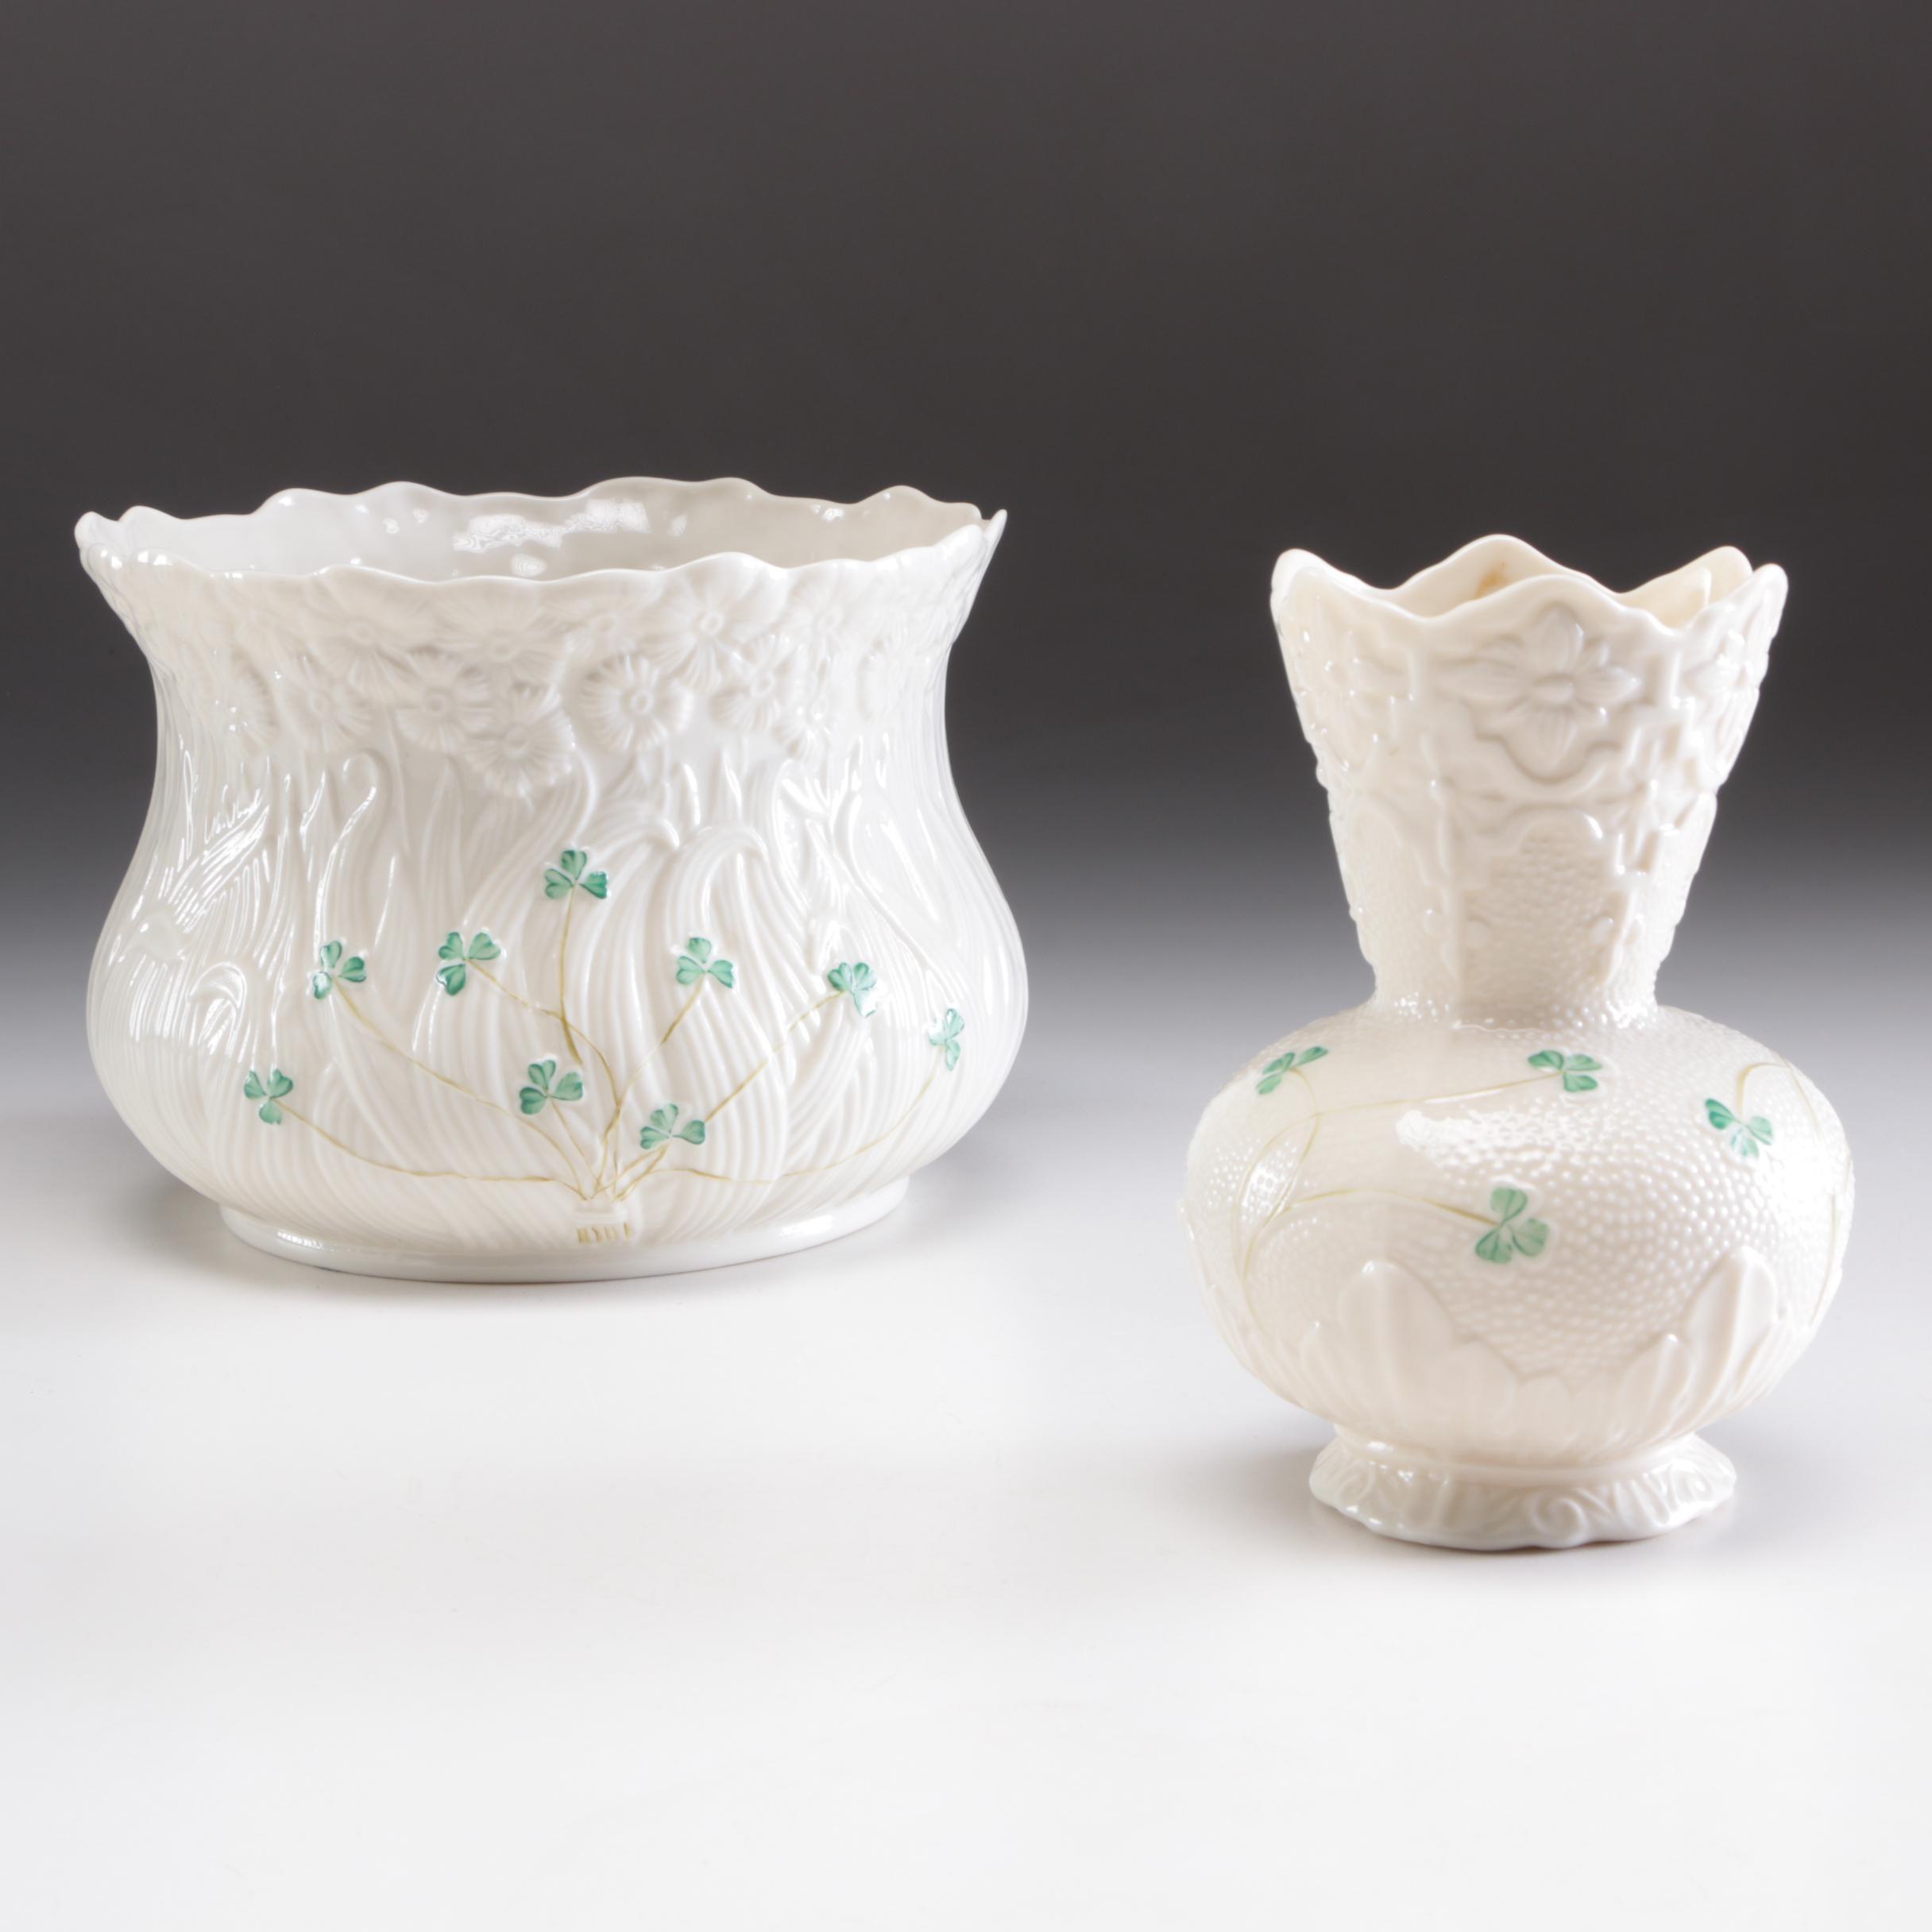 "Belleek Porcelain ""Shamrock"" Planter and Vase, Mid to Late 20th Century"